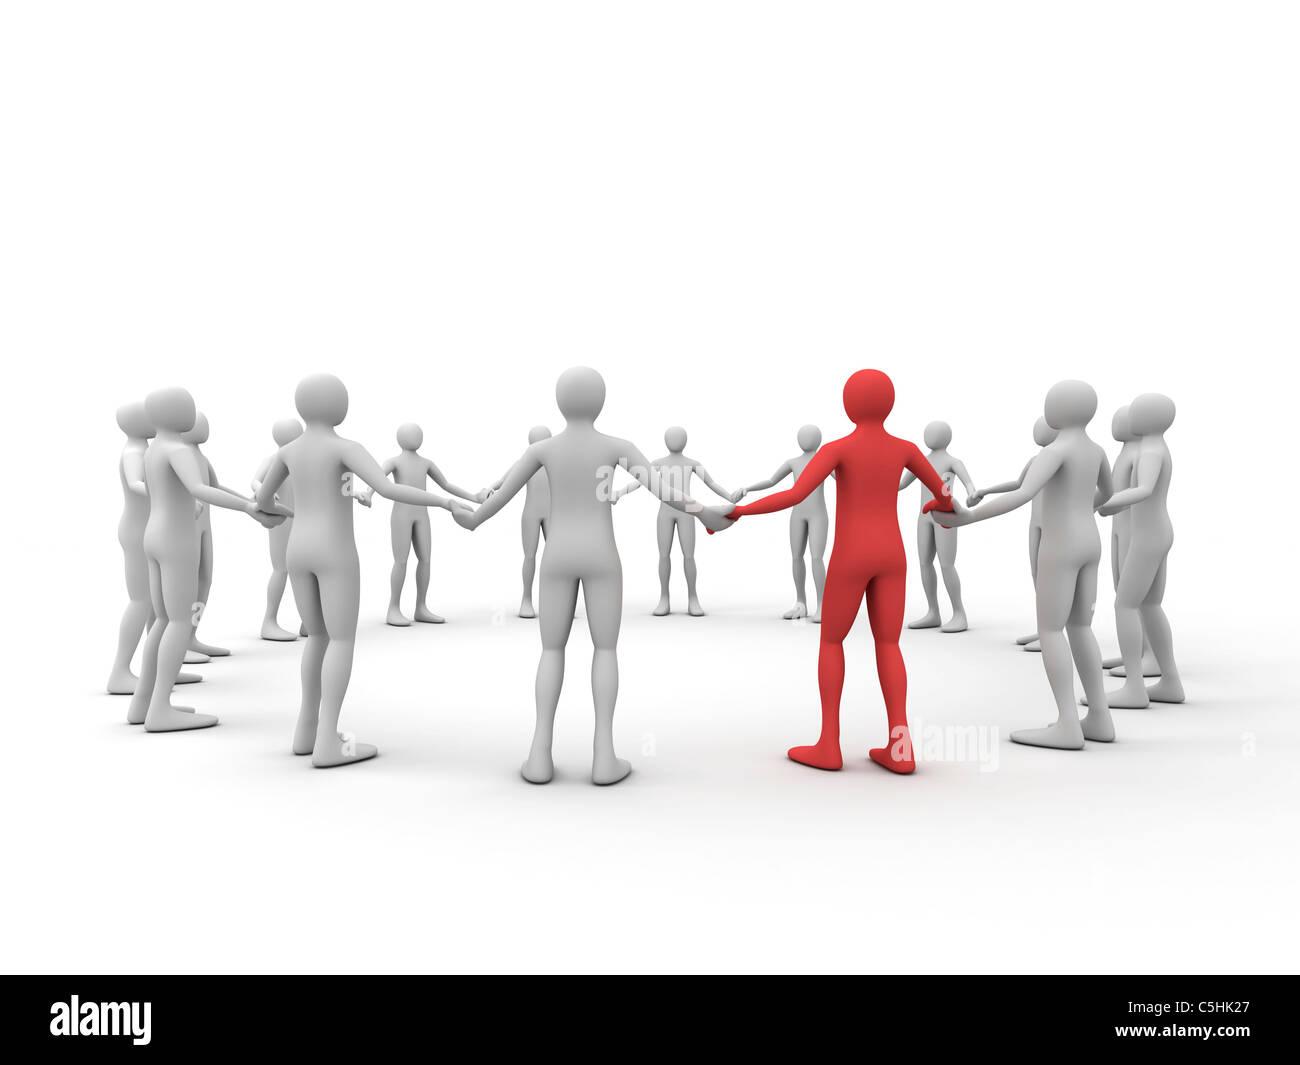 Human chain, artwork - Stock Image